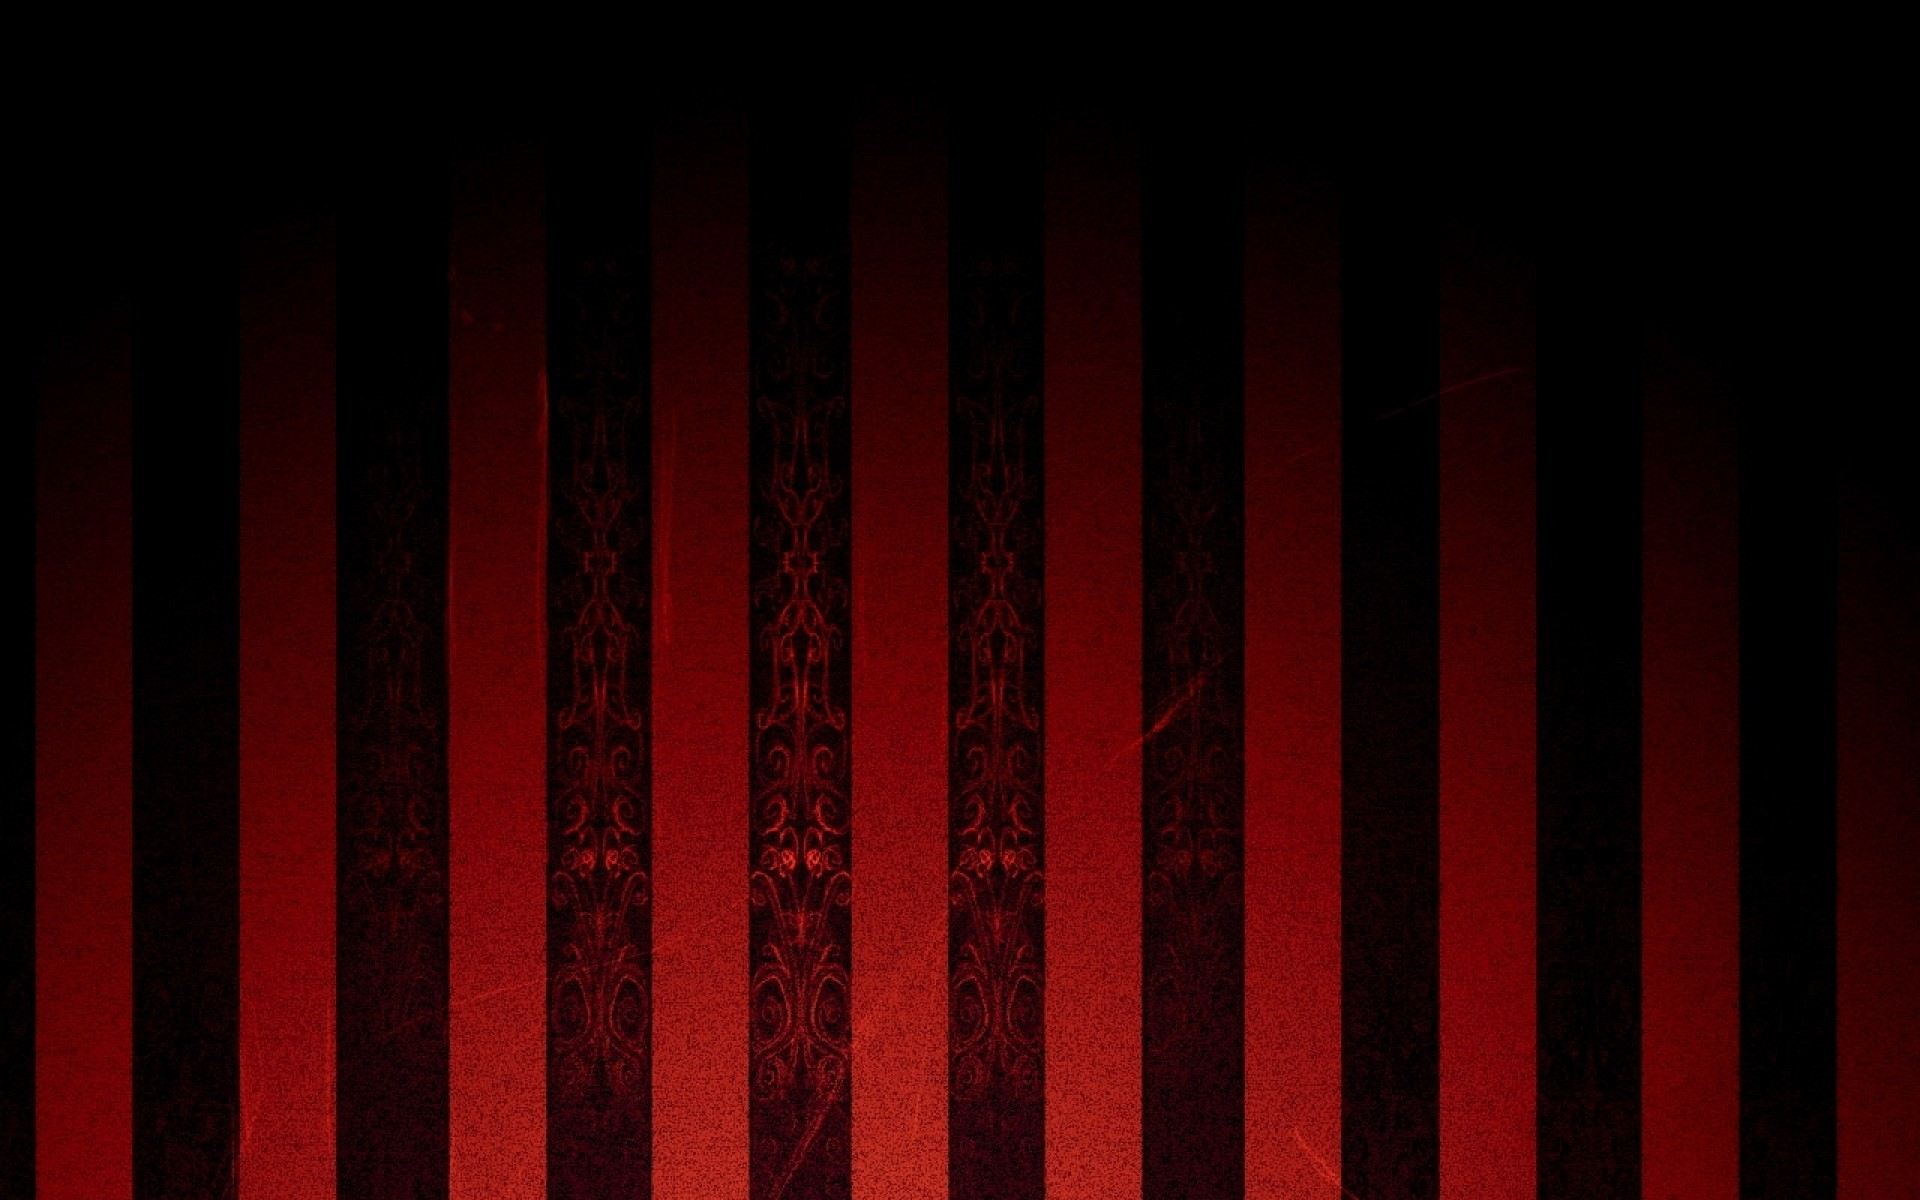 Black Red hd wallpaper for desktop | HD Wallpaper